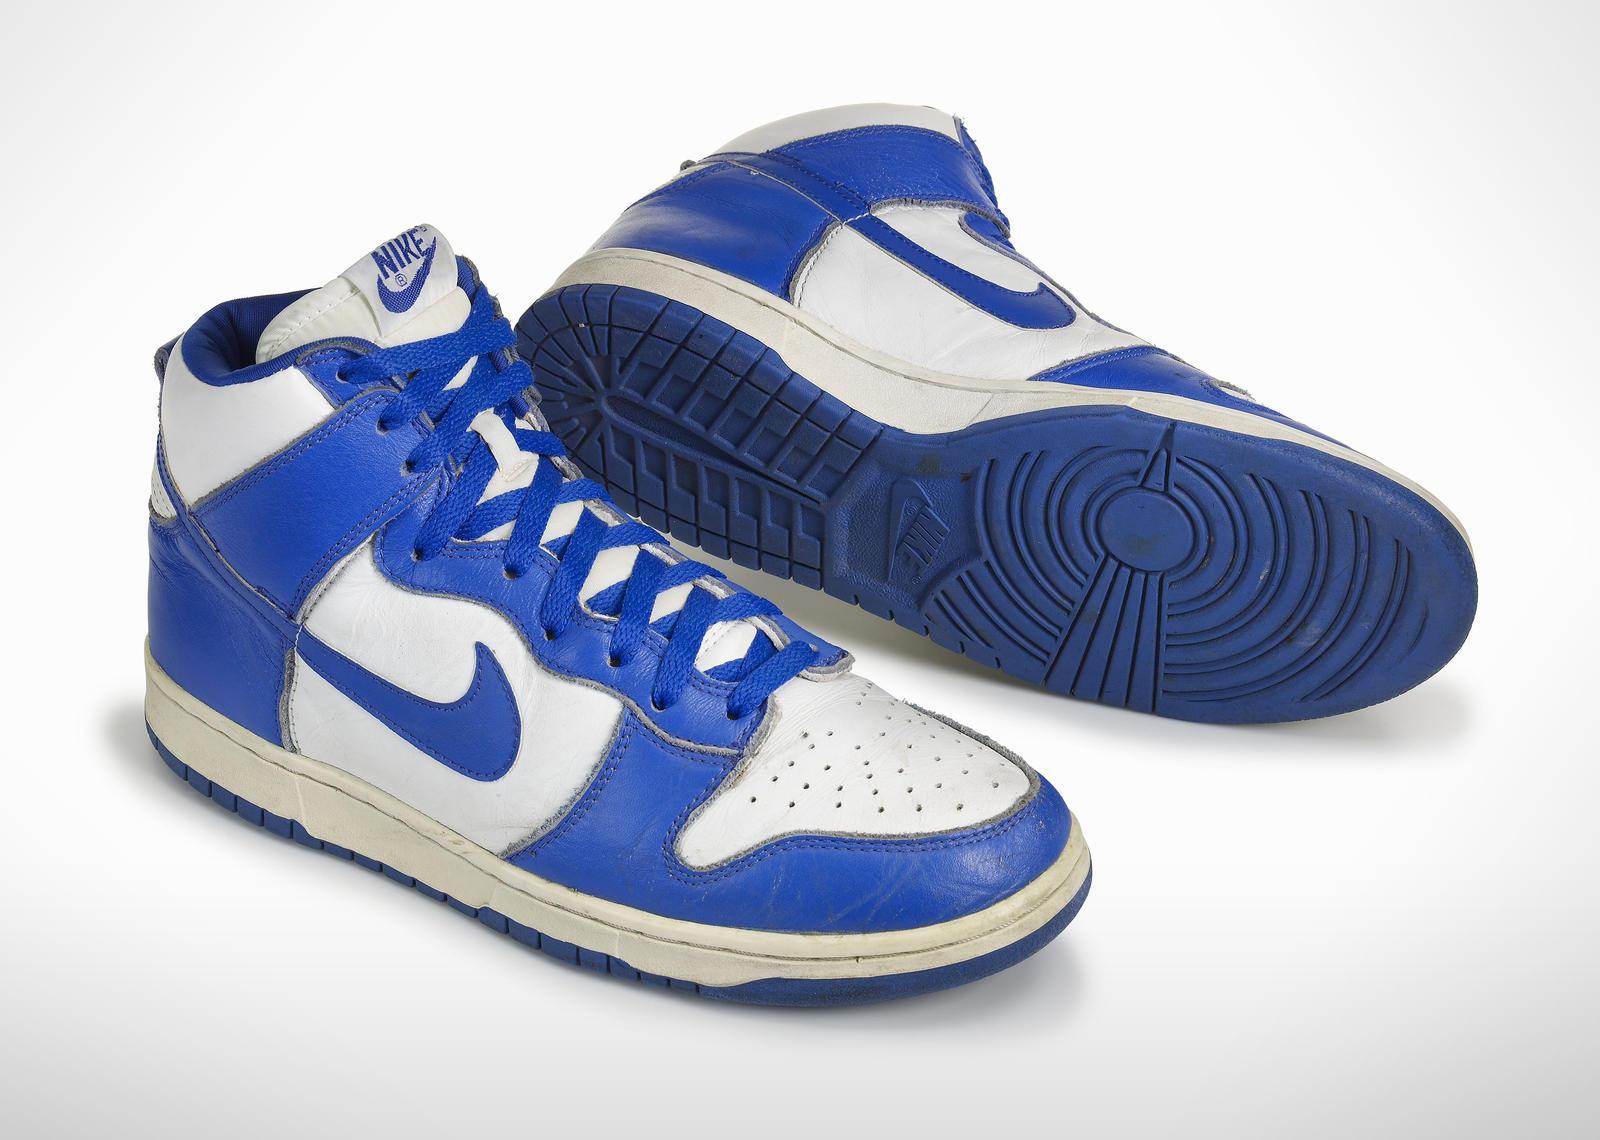 First Ever Nike Basketball Shoe